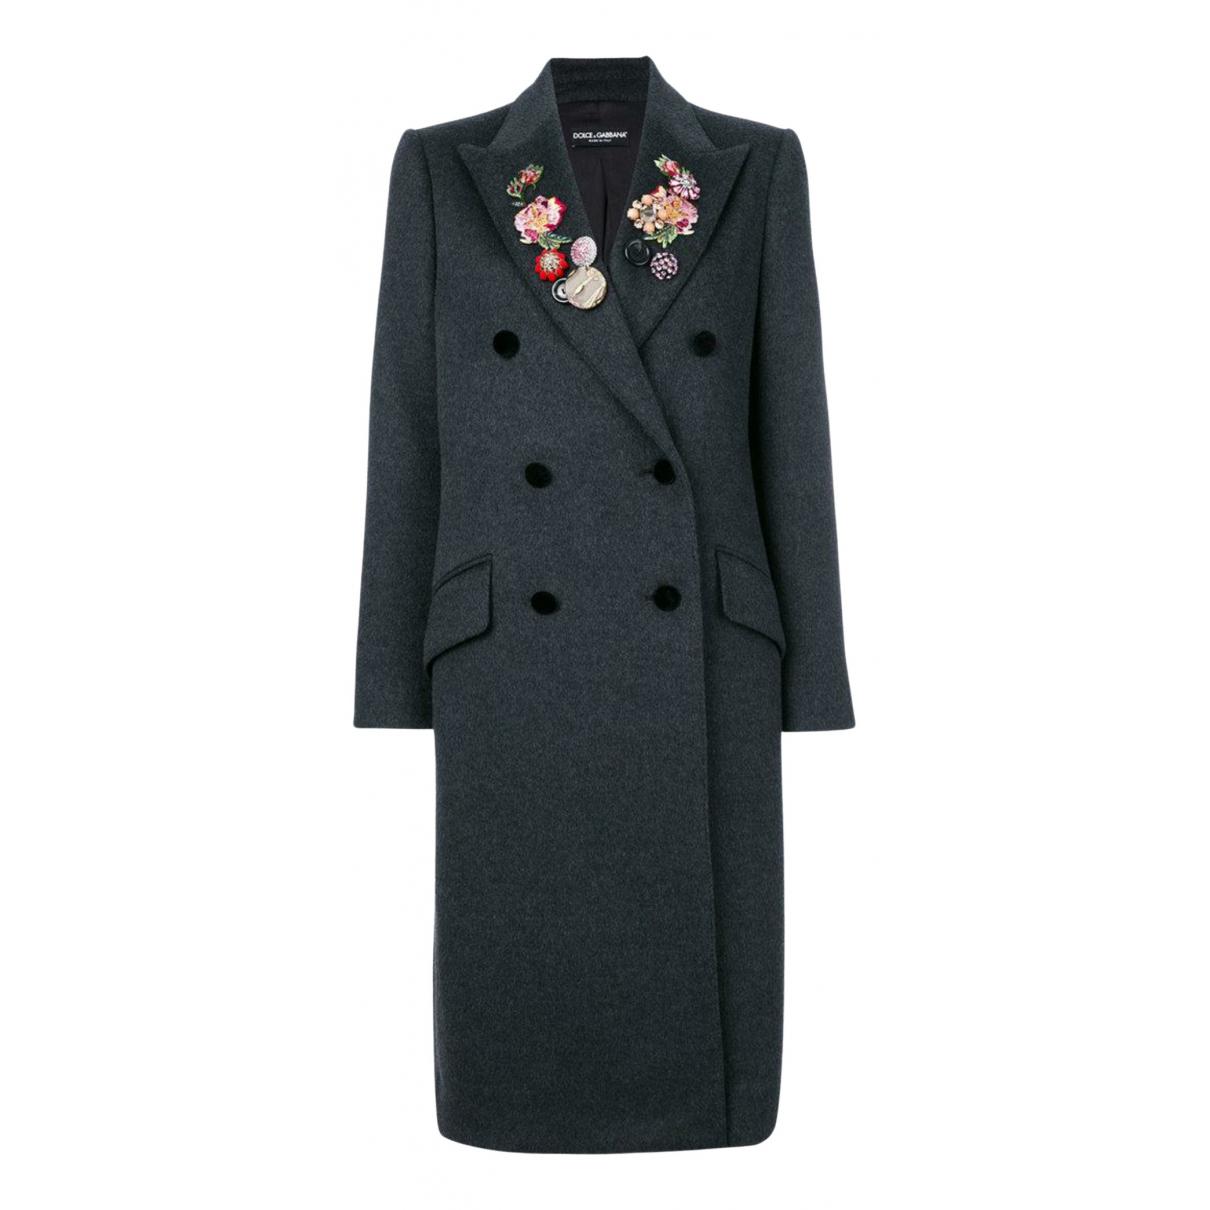 Dolce & Gabbana N Grey Wool Coat for Women